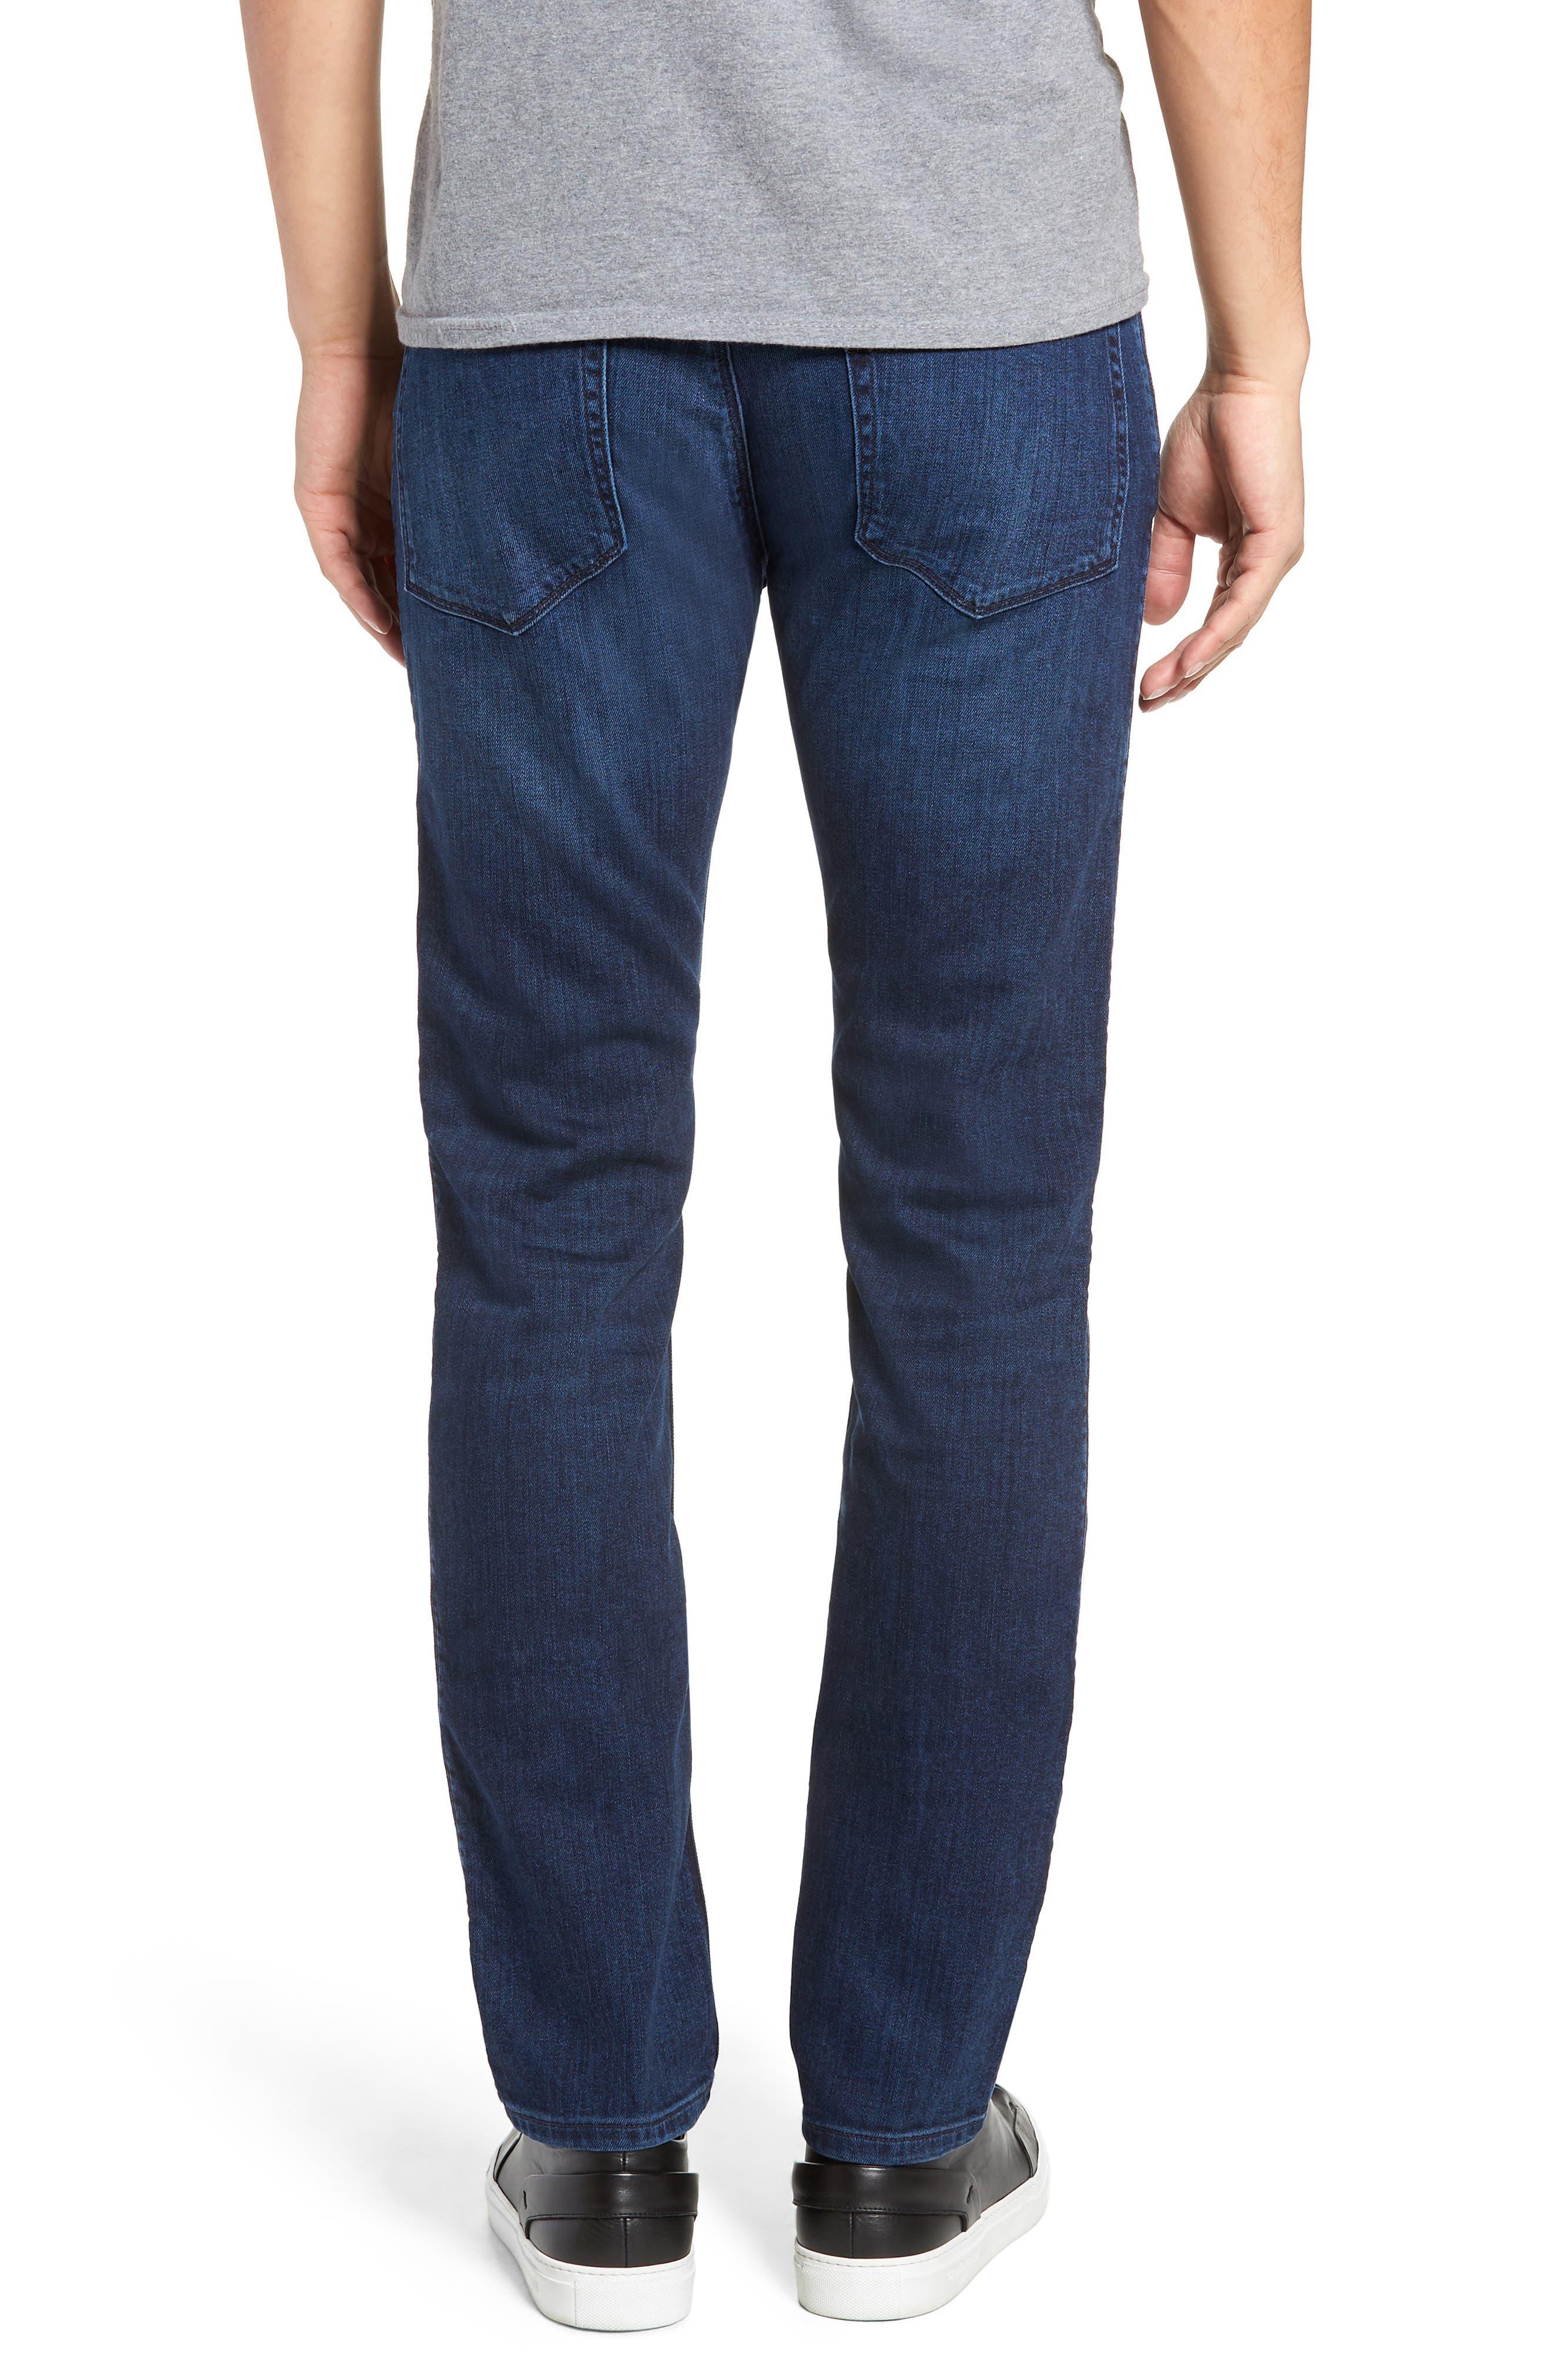 708 Stretch Slim Fit Jeans,                             Alternate thumbnail 2, color,                             420